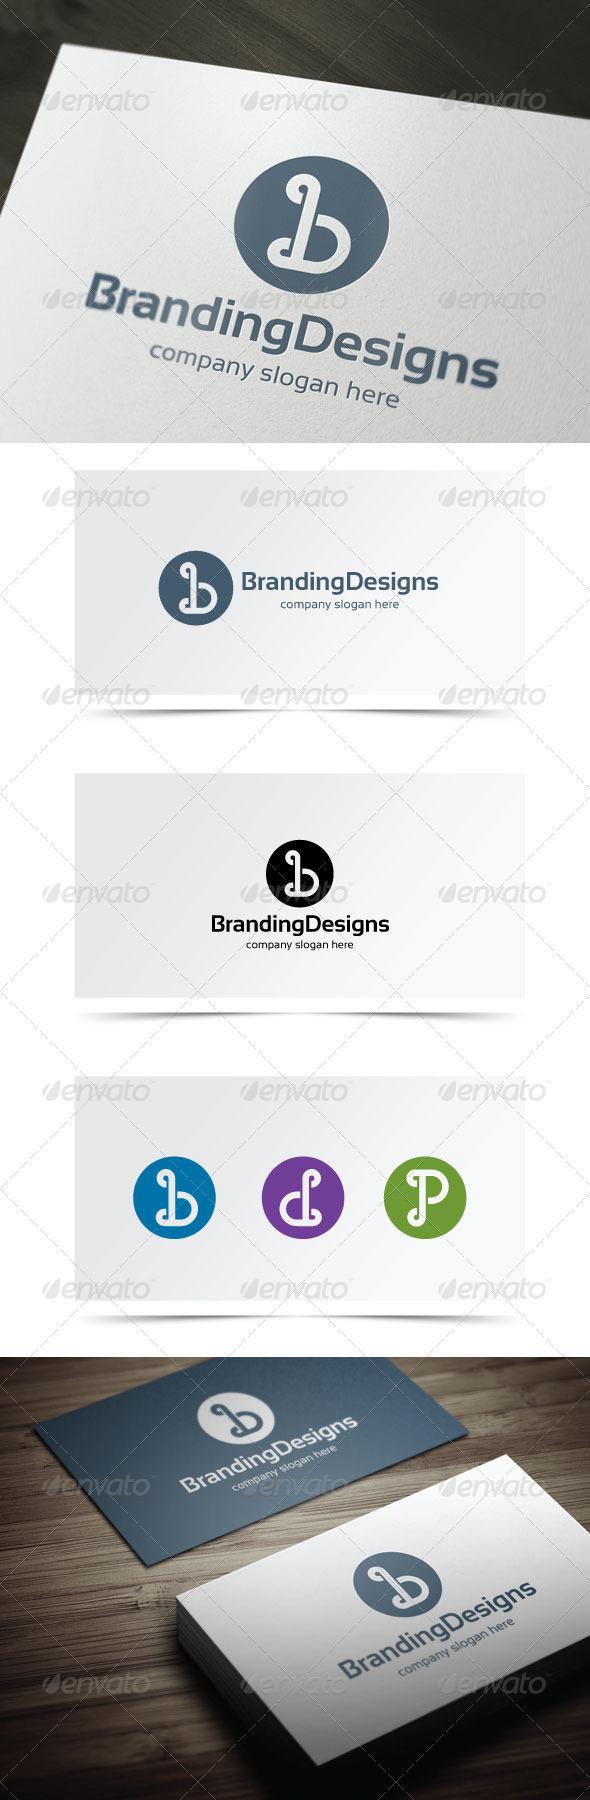 Branding Designs - Letters Logo Templates